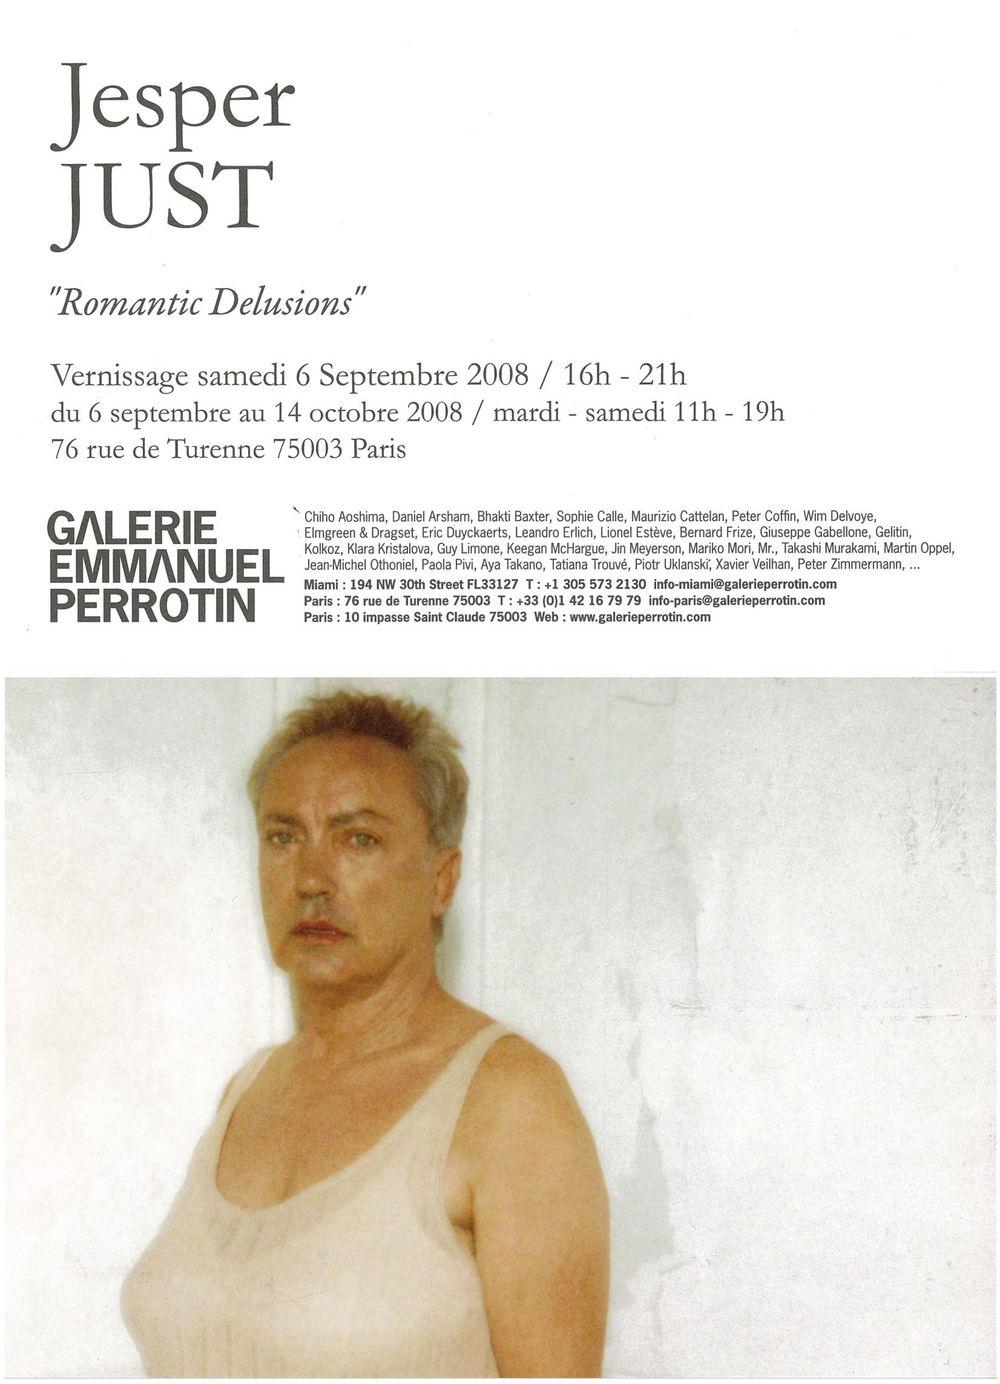 Artist:Jesper JUST, Exhibition:Romantic Delusions